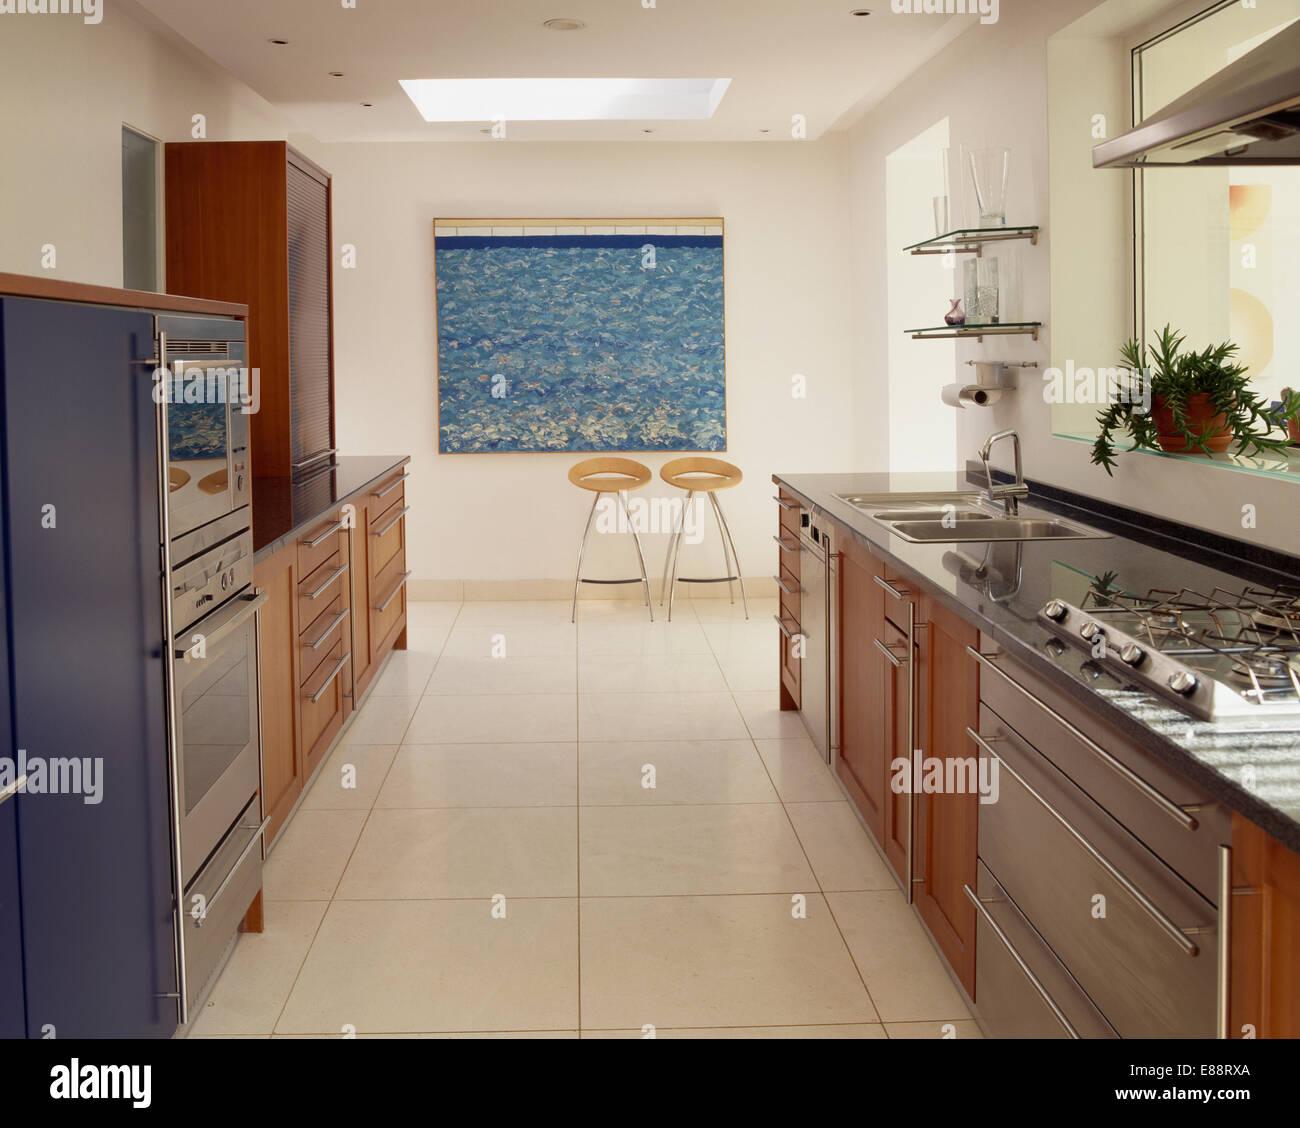 Cream travertine flooring in large modern galley kitchen with hob cream travertine flooring in large modern galley kitchen with hob set in fitted unit dailygadgetfo Images